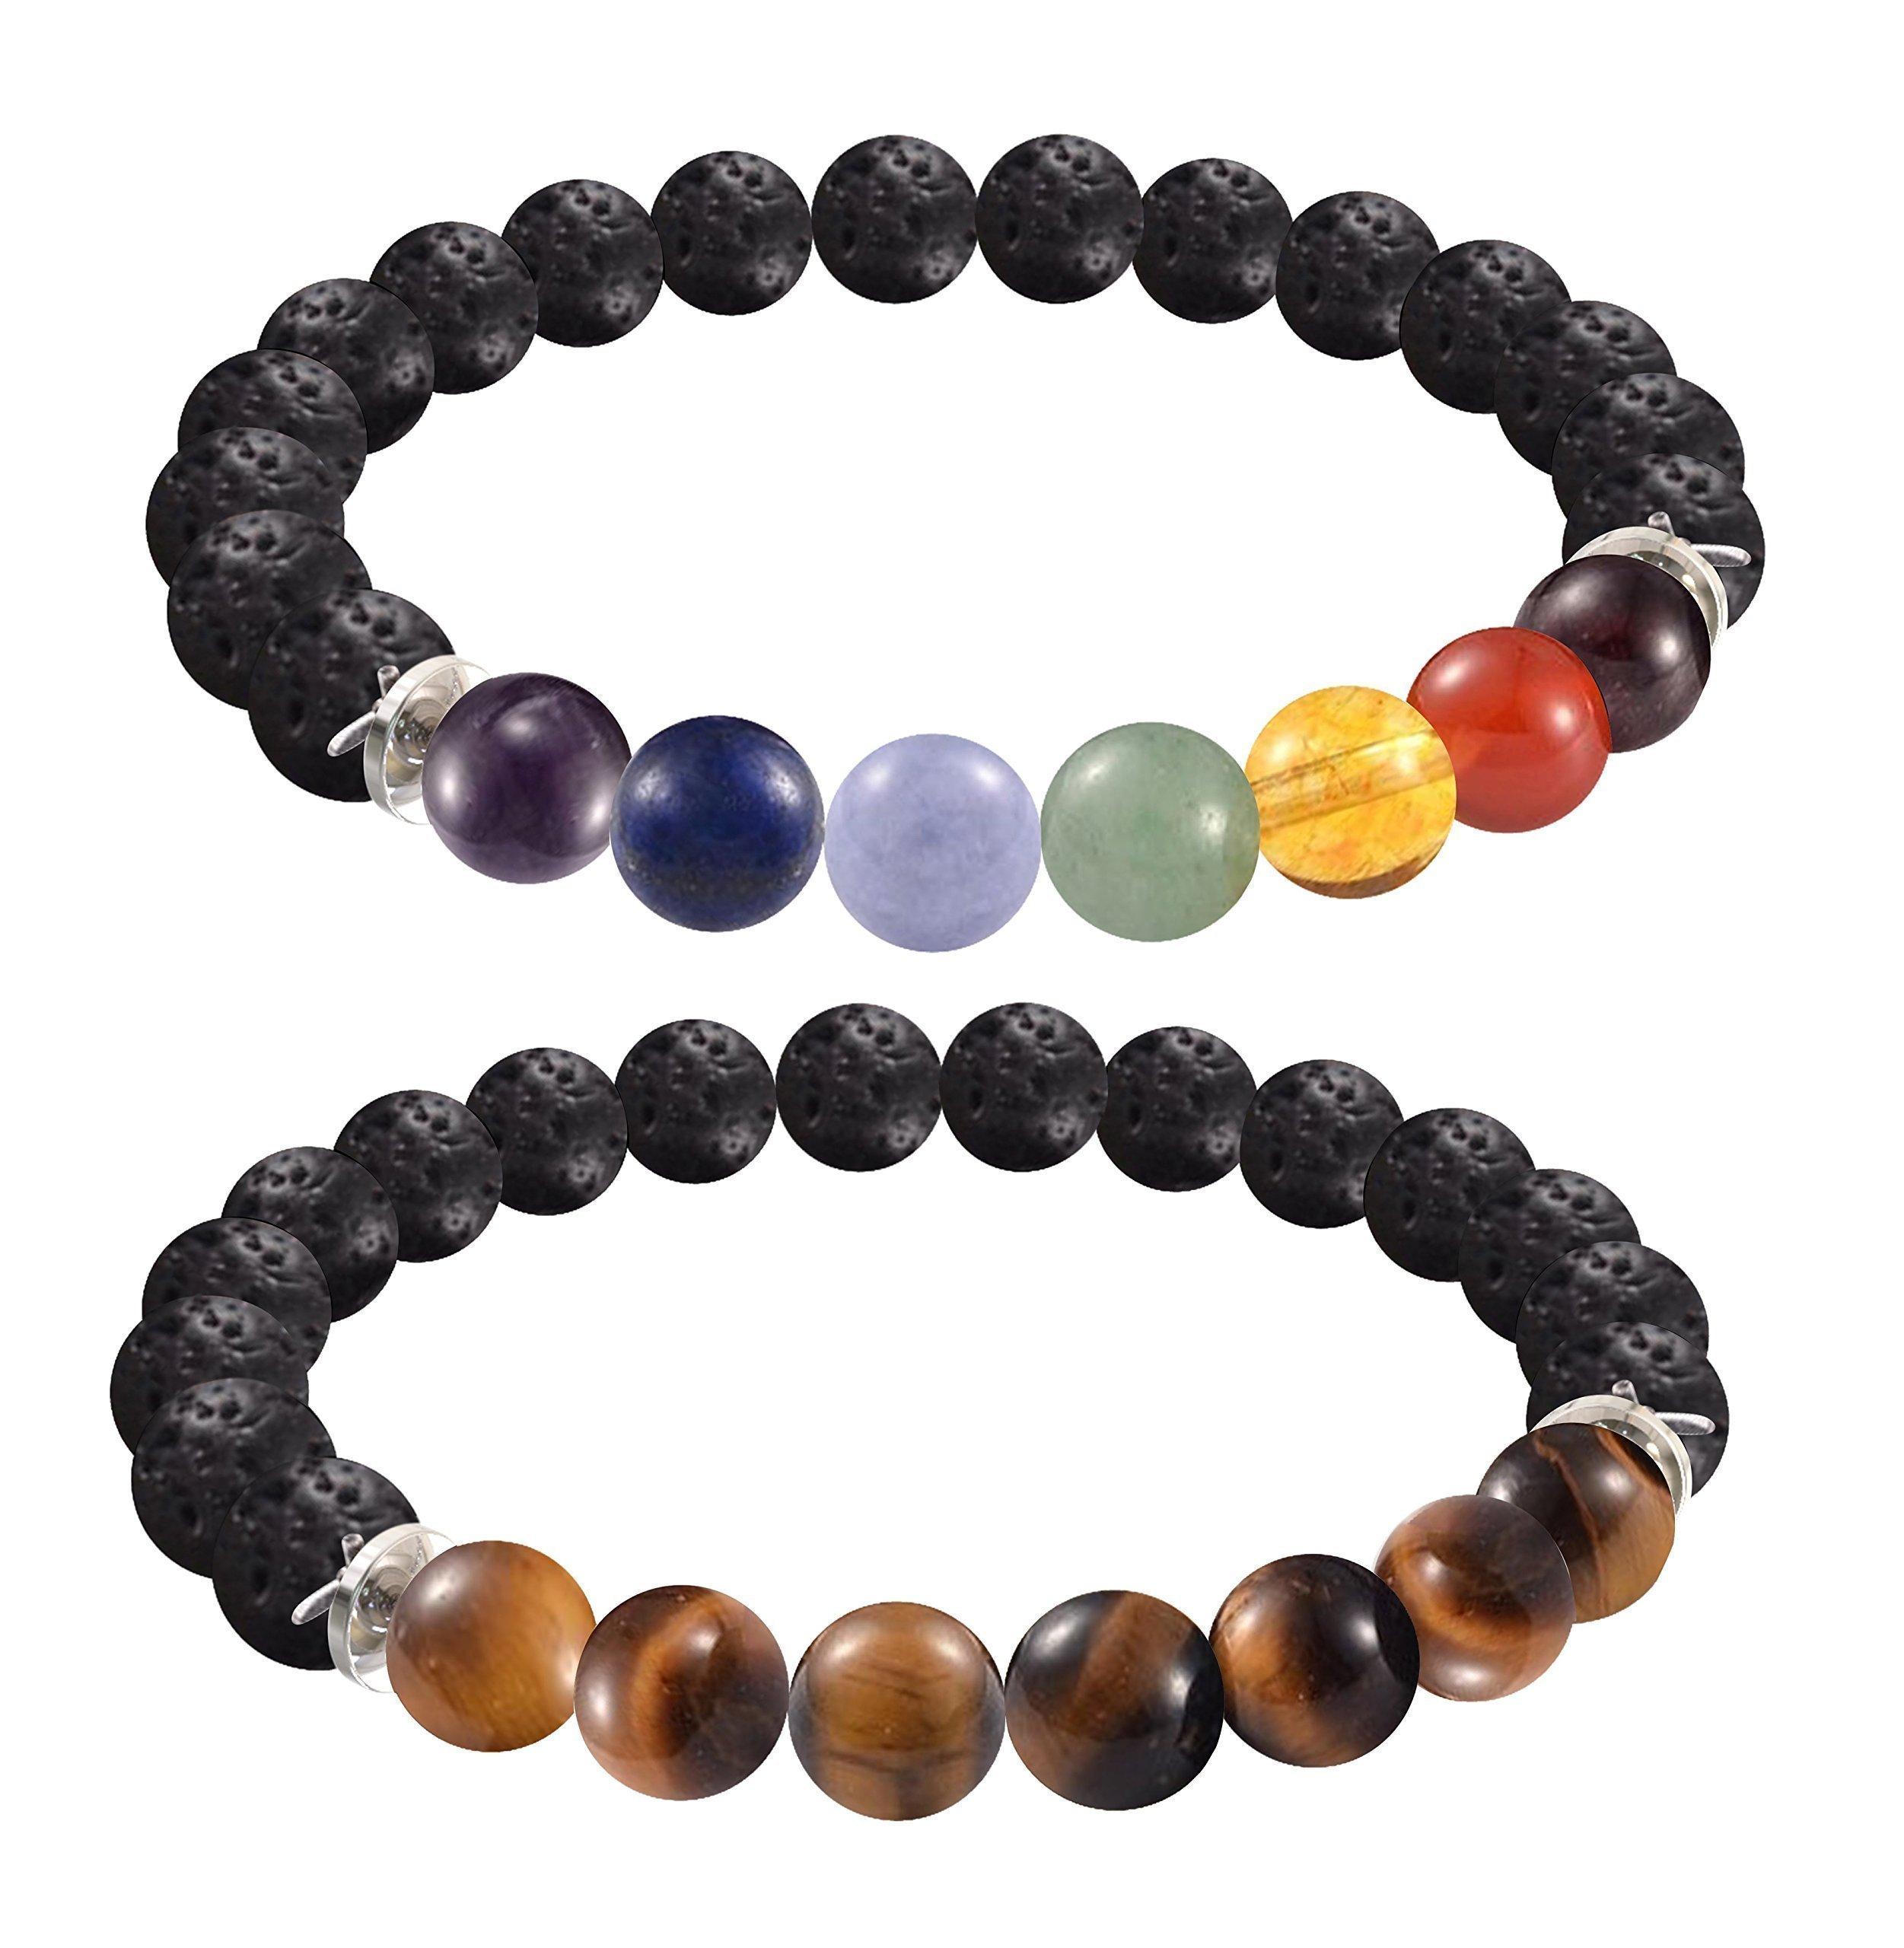 "2 FOR 1 Lava Rock Bead Essential Oil Diffuser 7 Chakra Healing Bracelet Gemstone Tigers Eye Combo Stretch Bracelet Health Wellness Fits Most 7.5-8.5"" Unisex 60 Day Satisfaction Guarantee 2 Bracelets"